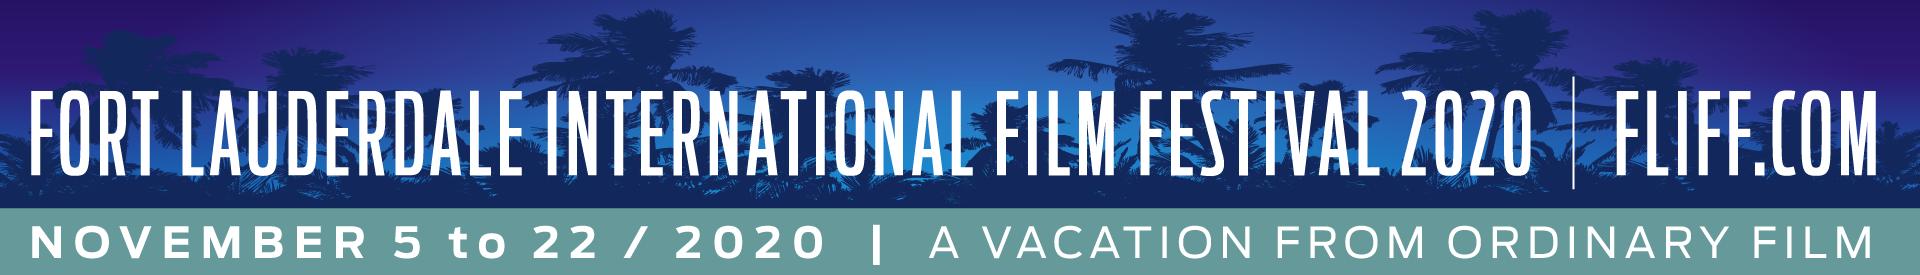 35th ANNUAL FORT LAUDERDALE INTERNATIONAL FILM FESTIVAL